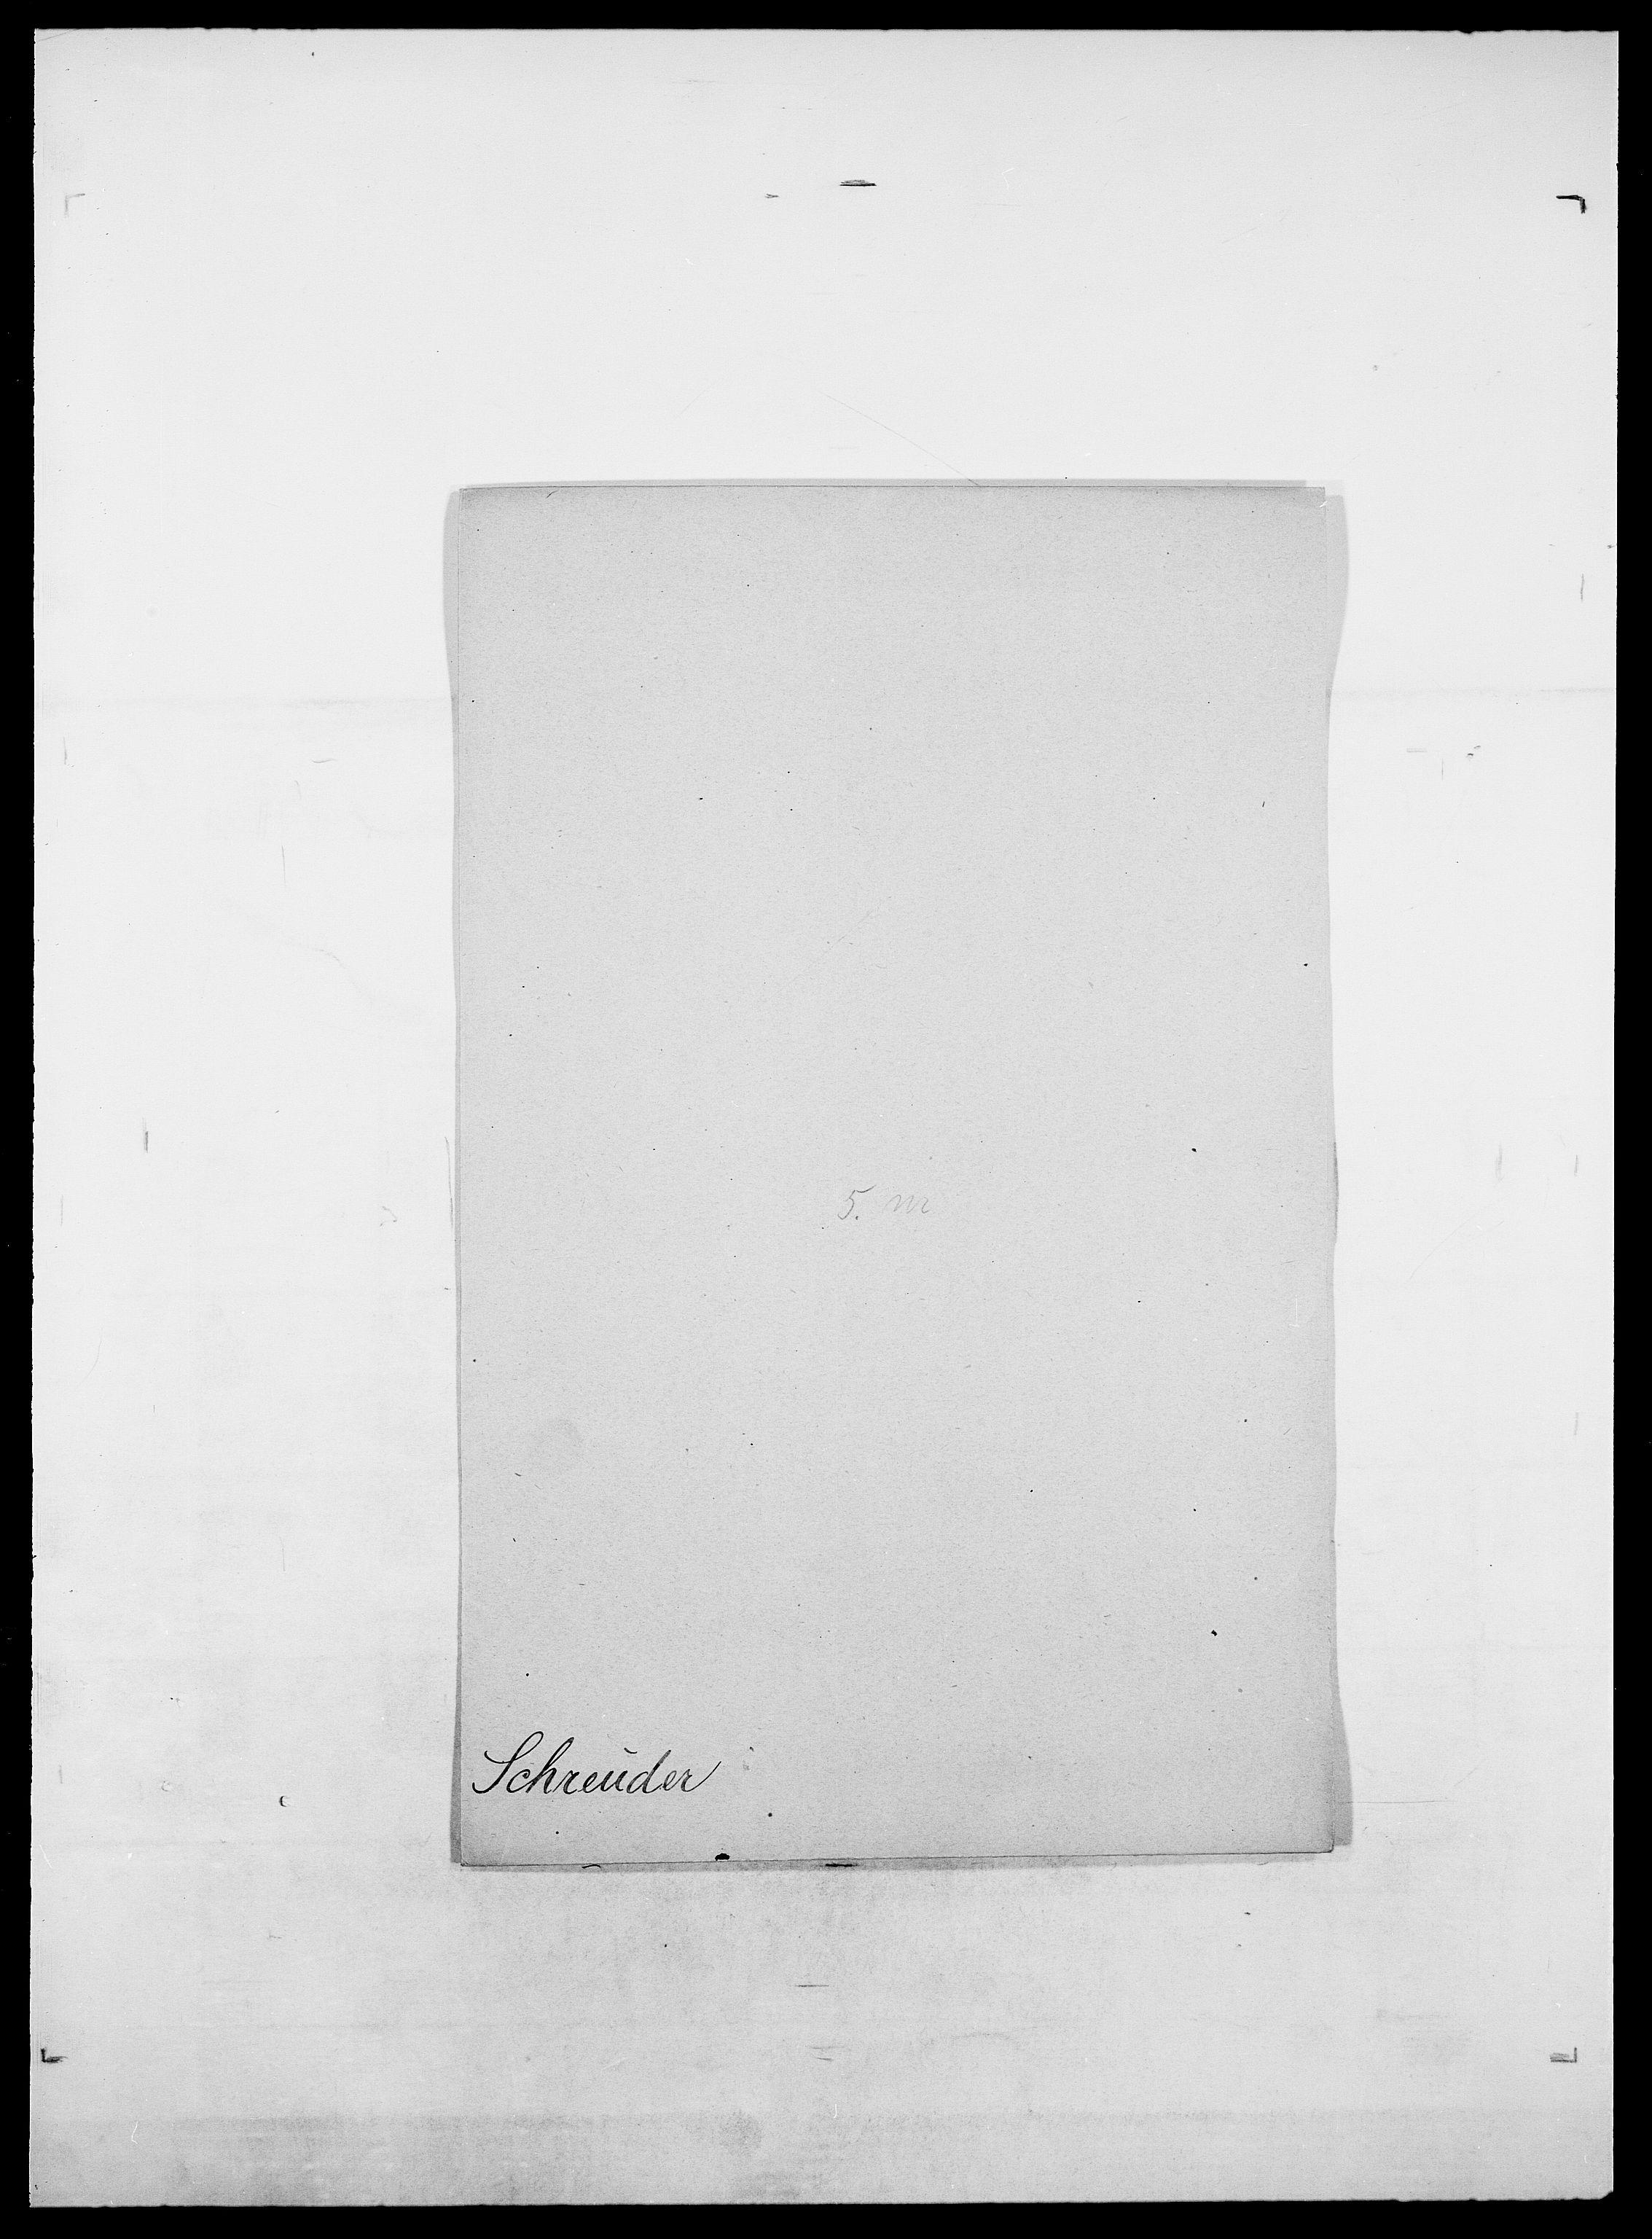 SAO, Delgobe, Charles Antoine - samling, D/Da/L0035: Schnabel - sjetman, s. 159